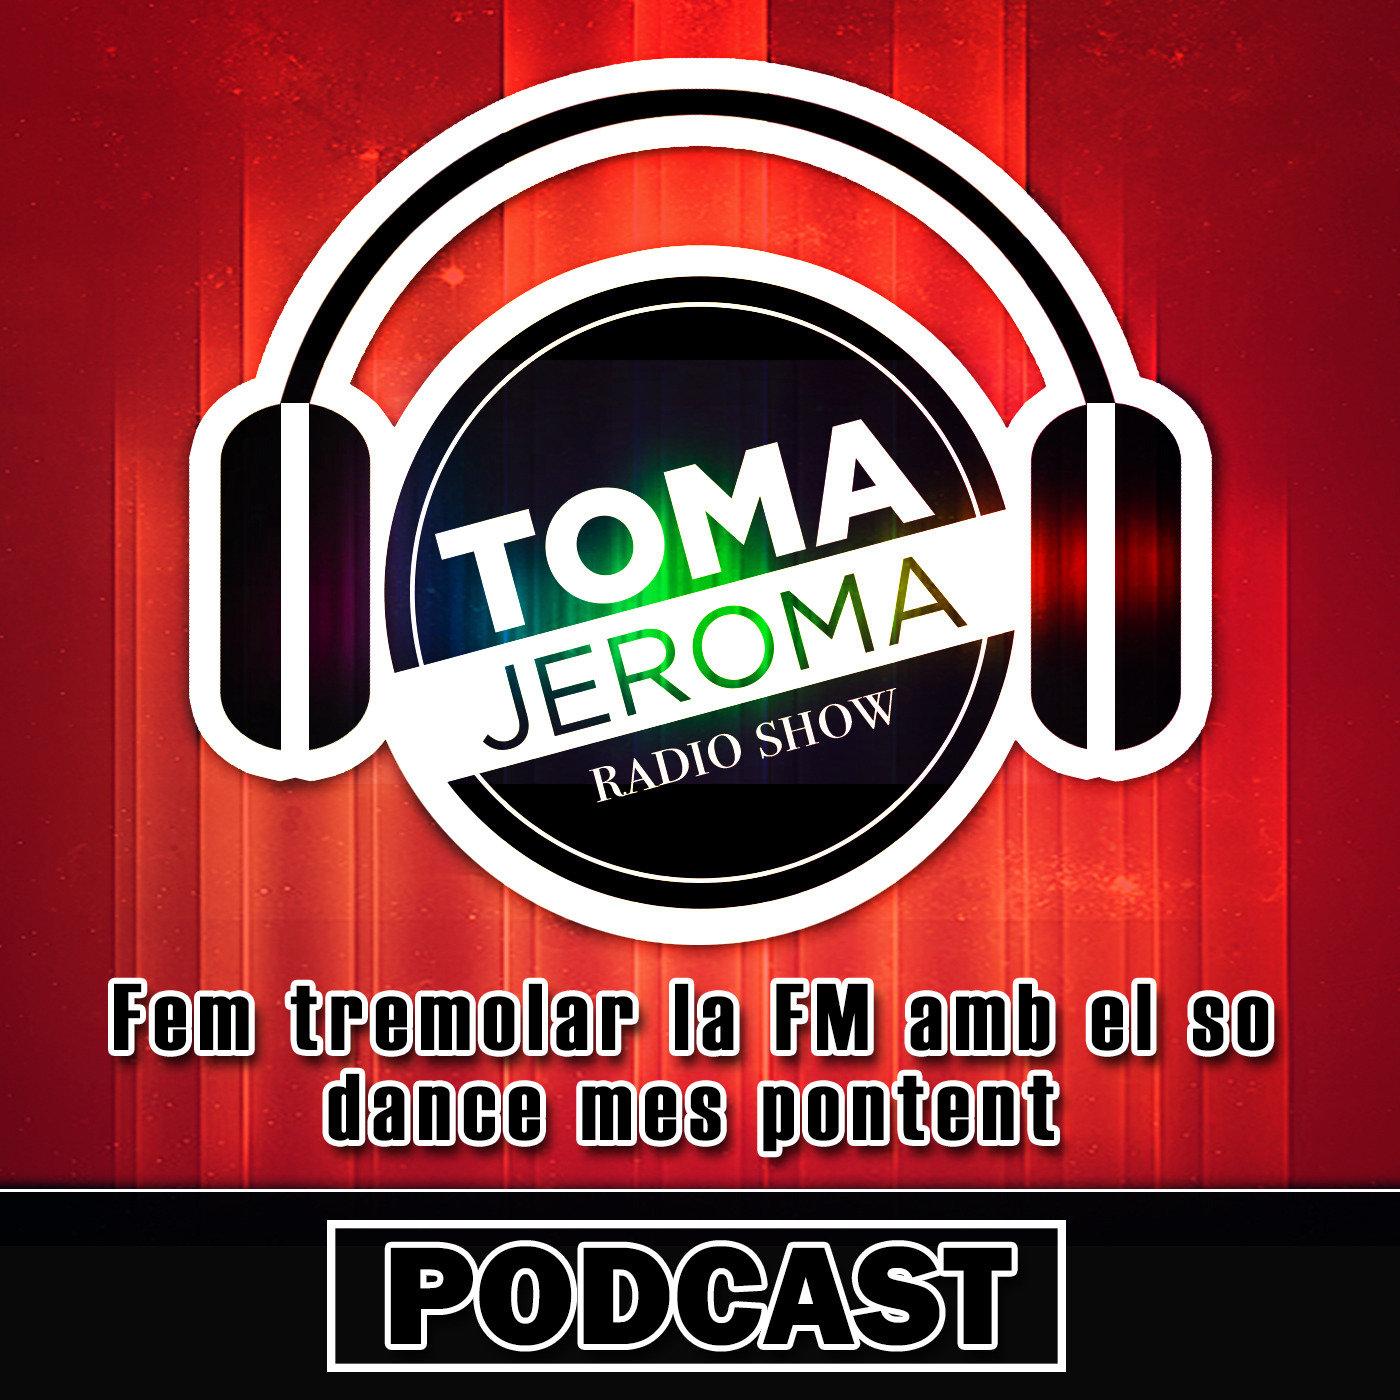 <![CDATA[Toma Jeroma Radio Show]]>